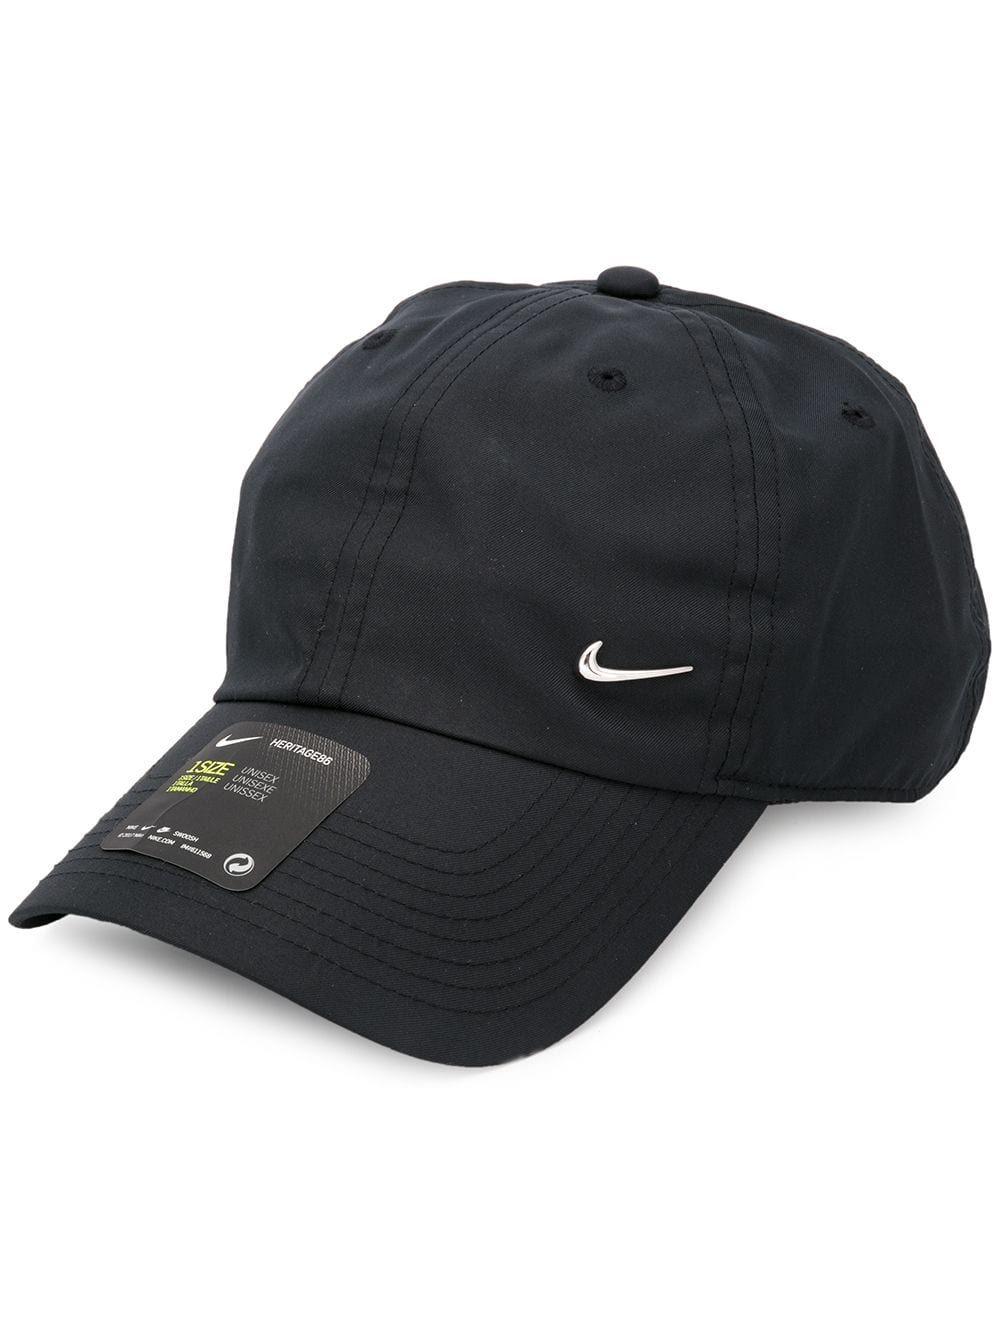 ea3c17c177a NIKE NIKE METAL SWOOSH H86 CAP - BLACK.  nike